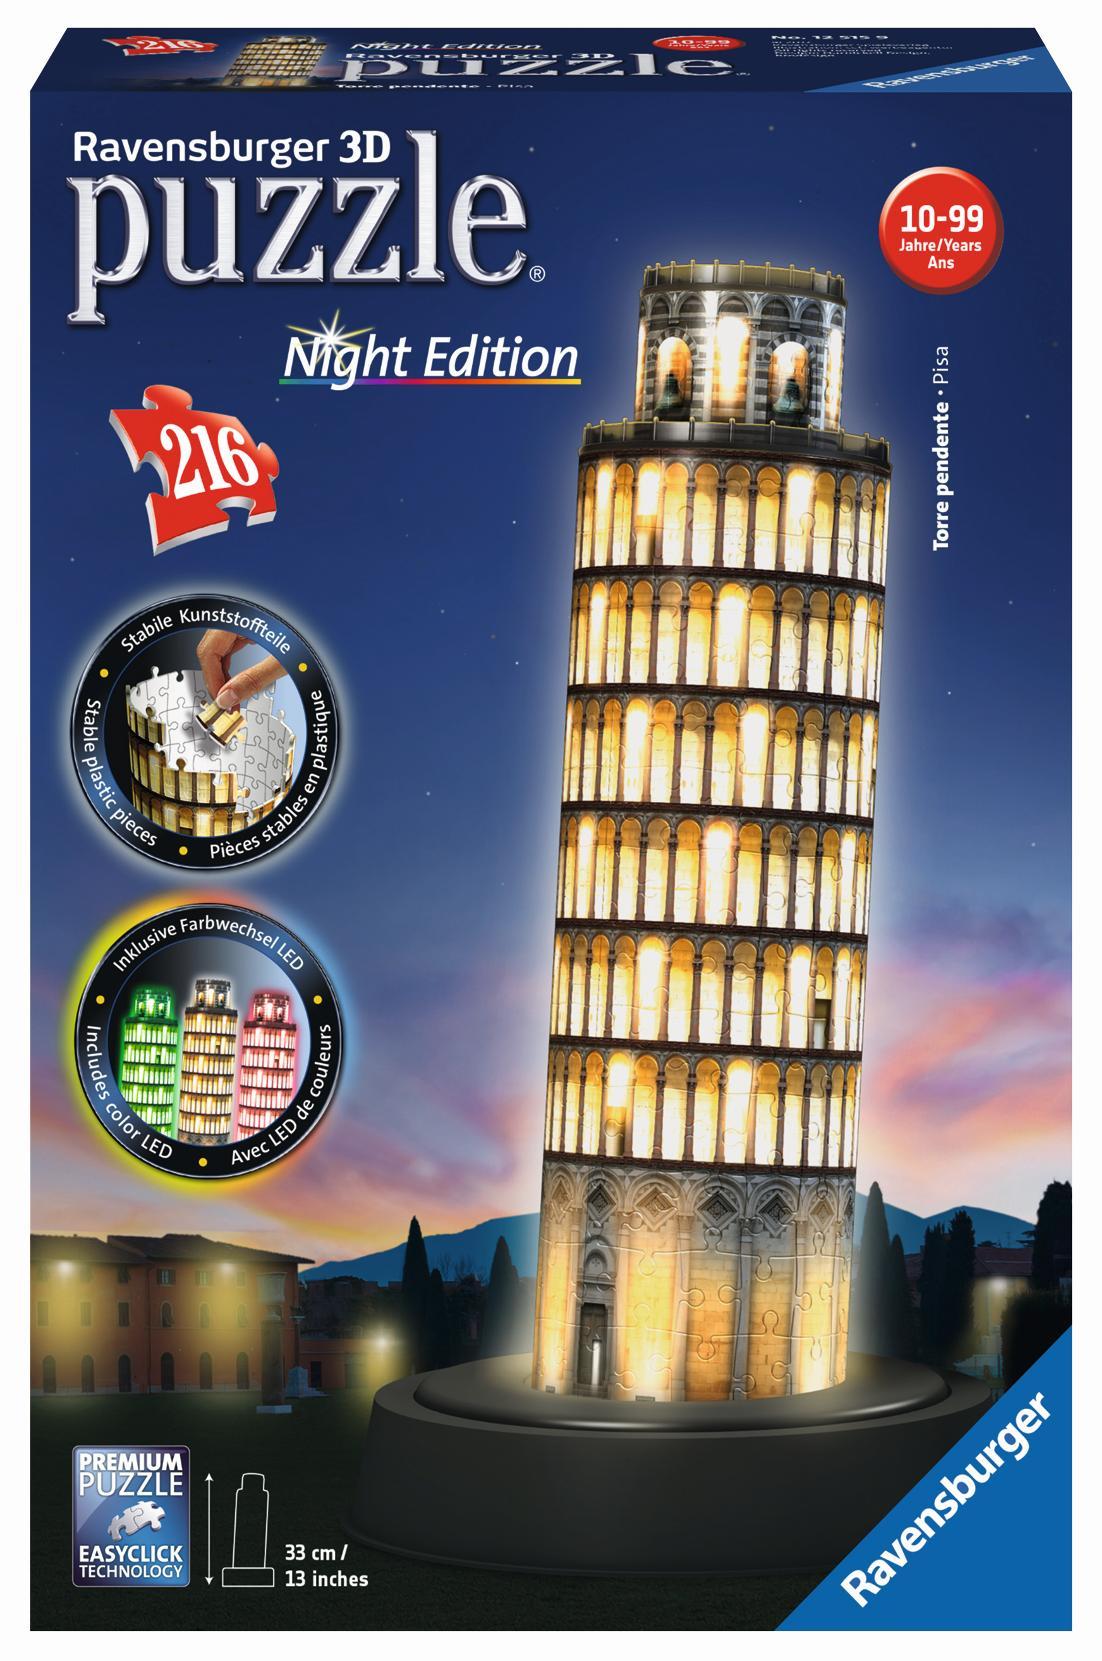 Ravensburger 3D Puzzle Der Schiefe Turm von Pisa